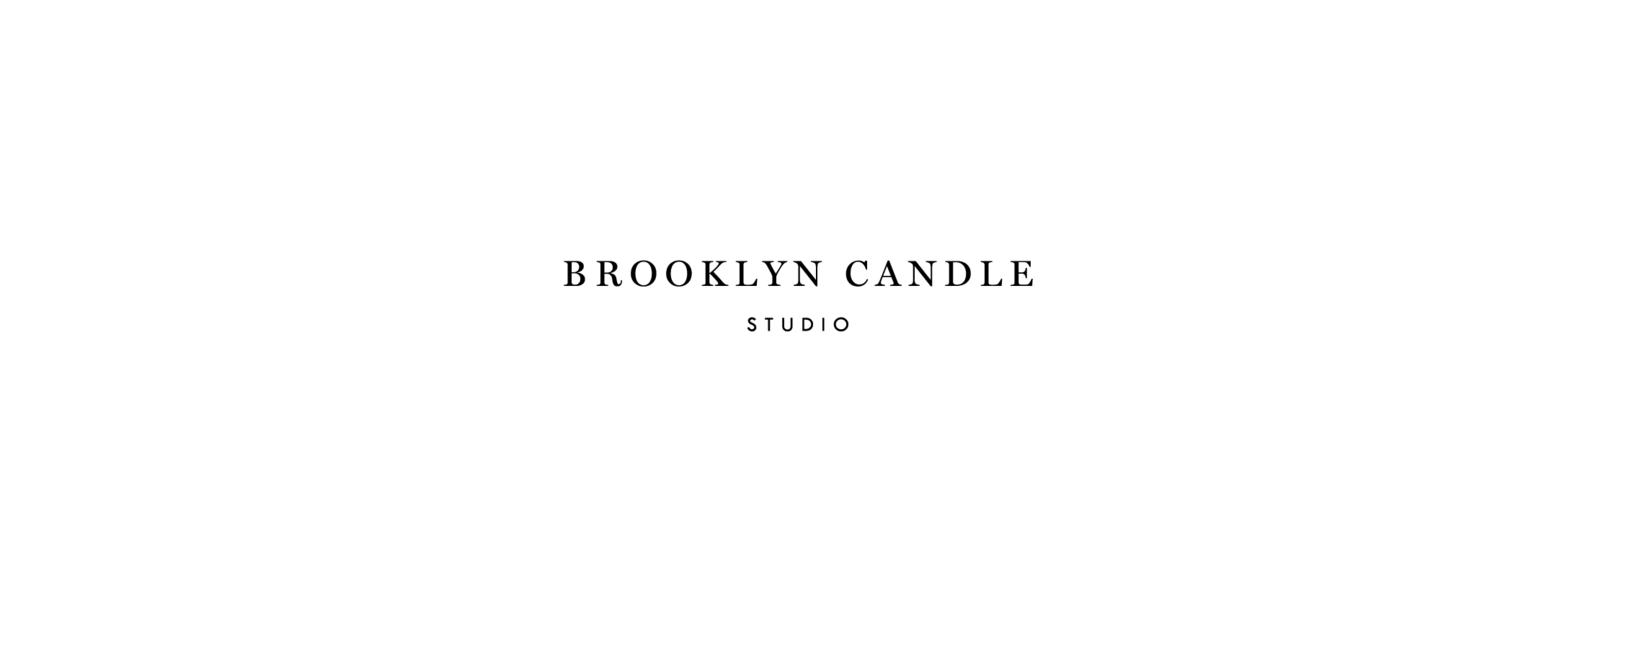 Brooklyn Candle Studio Discount Code 2021